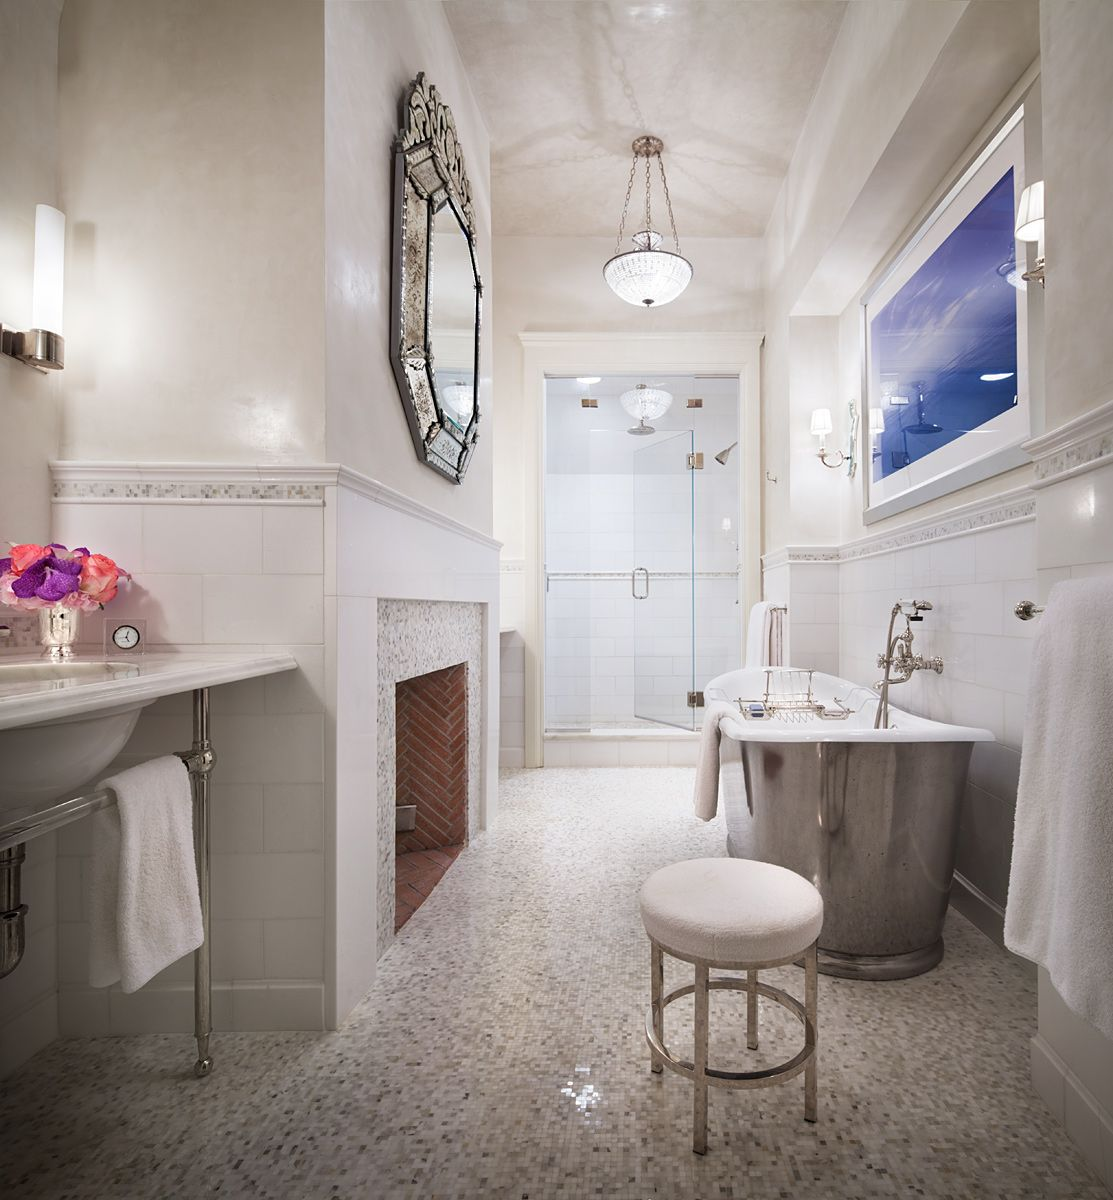 MHLLC Bath | Bathrooms | Pinterest | Bath, Bathroom inspiration and ...